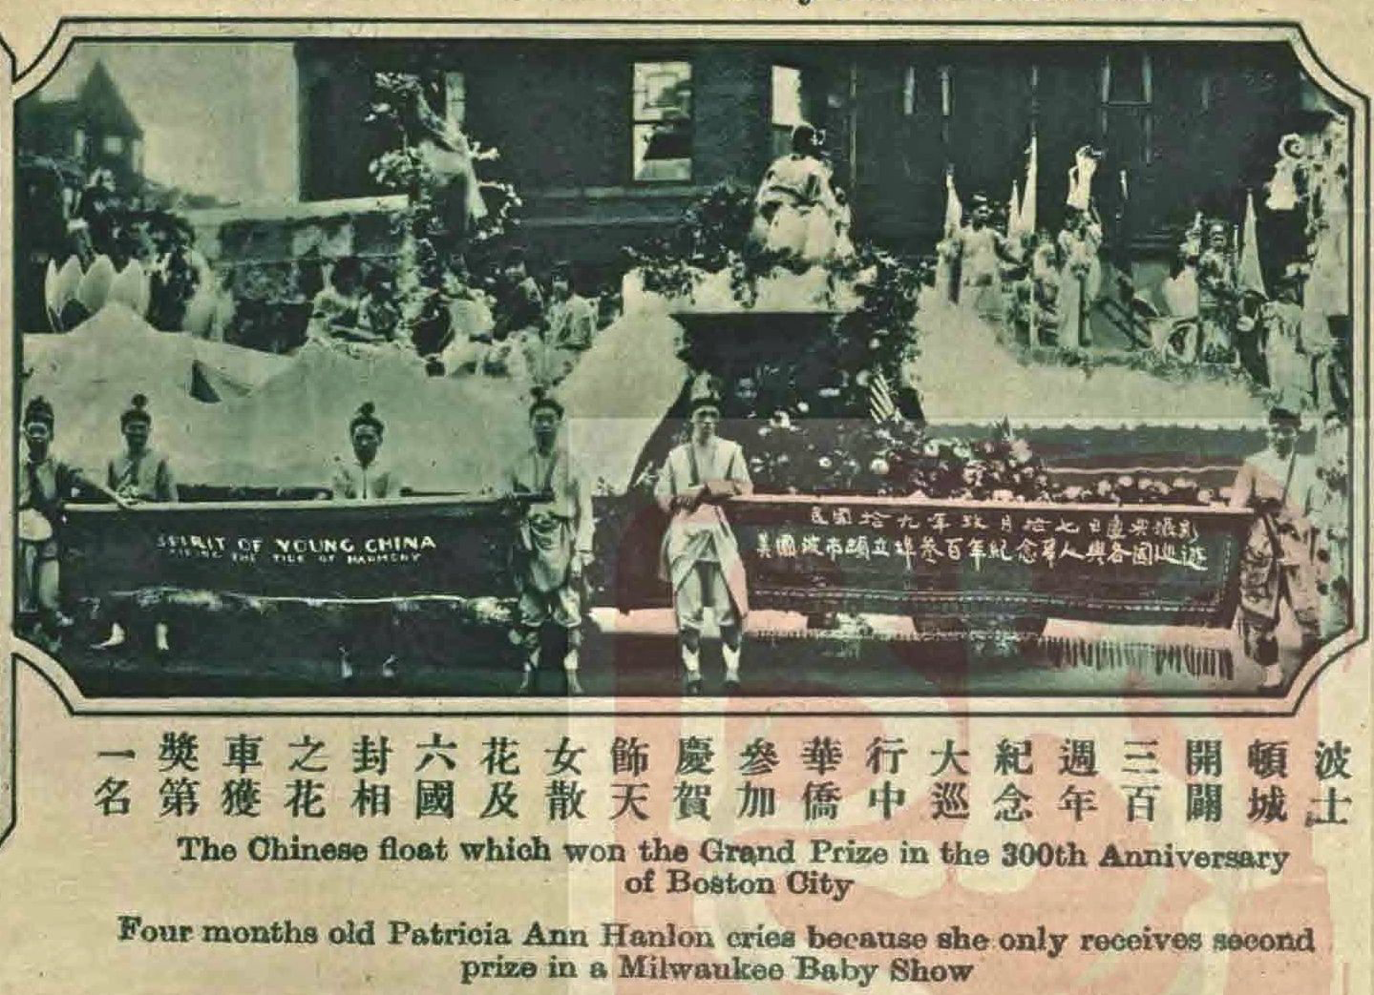 Florence Vandamm photograph海外趣事:波士頓城開闢三百週年紀念大巡行, 中華僑參加慶賀飾天女散花……:[照片] Boston float 1930.